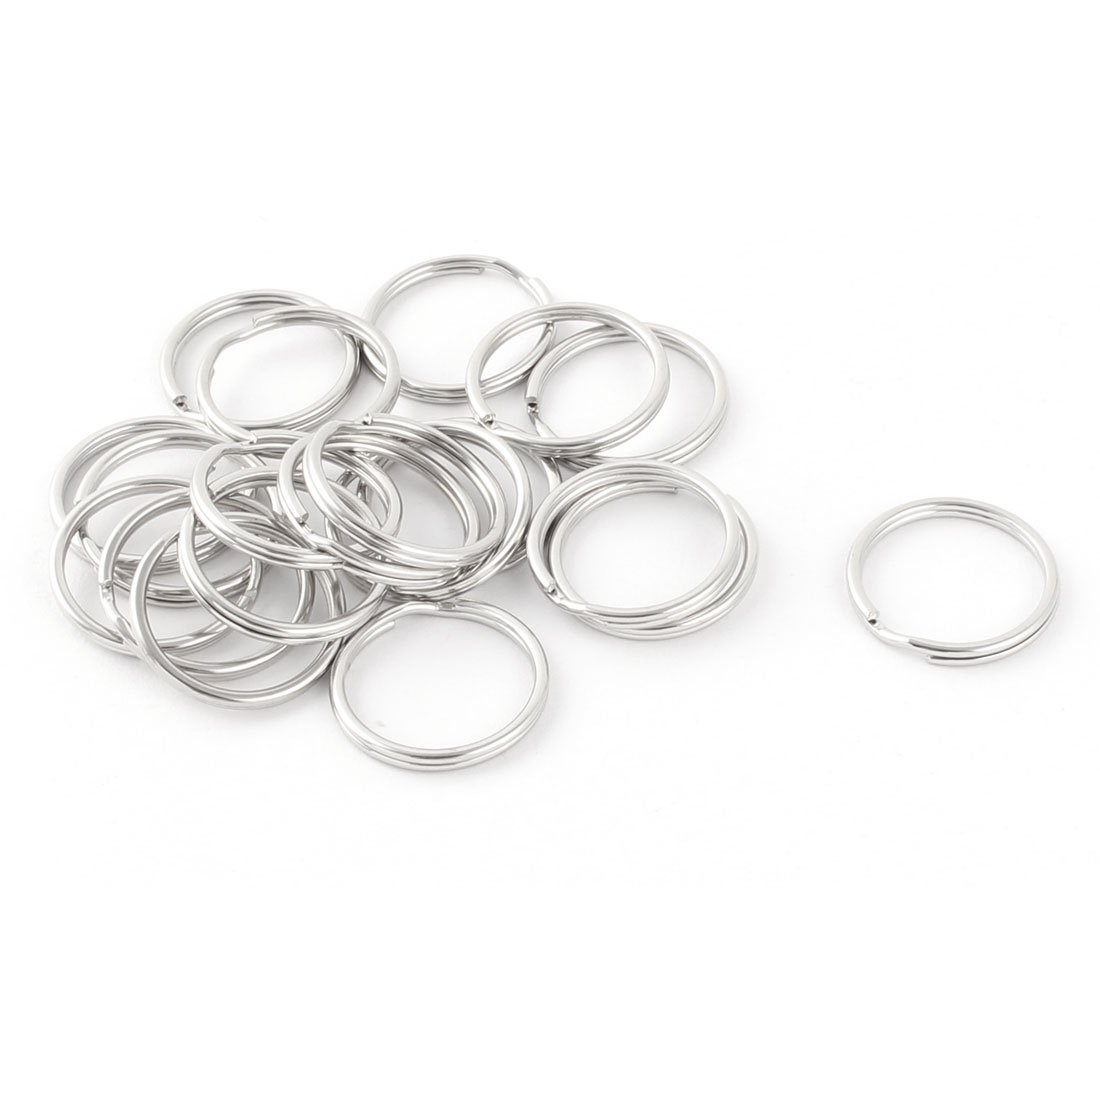 Metal Free DIY Keys Ring Chain Key Split Loop Holder Silver Tone 20mm Diameter 20 Pcs